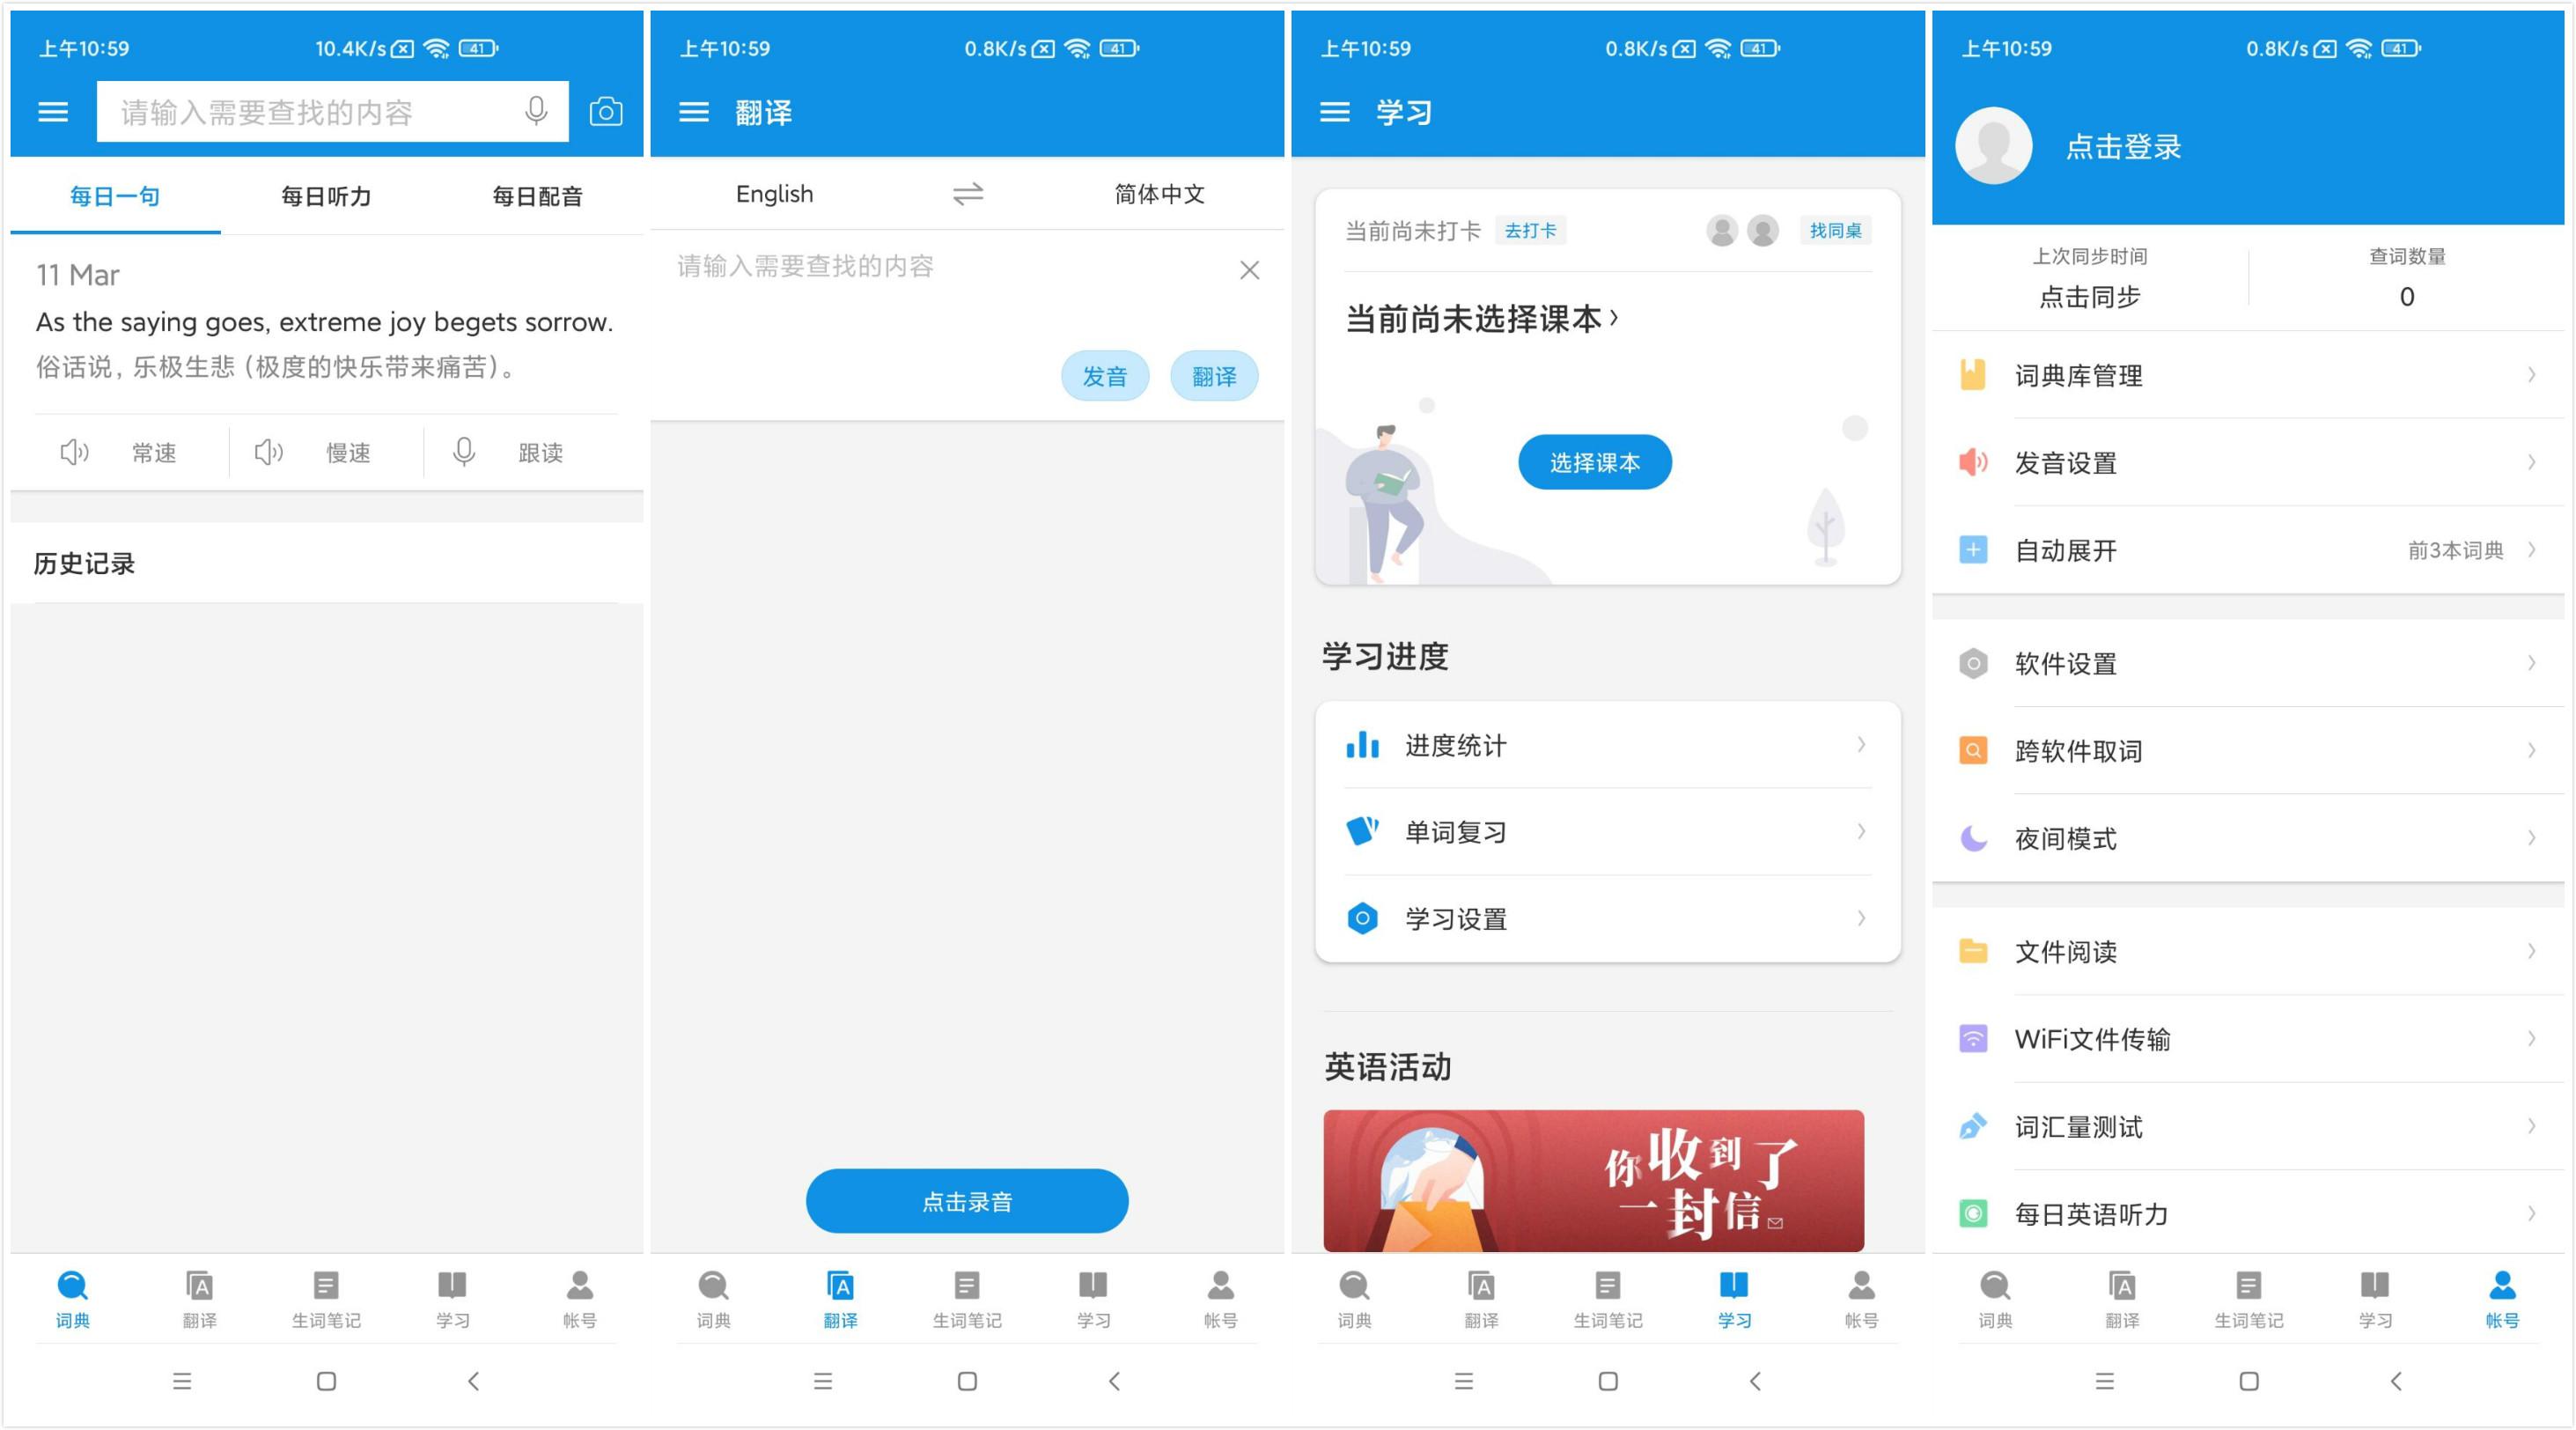 Android 欧路词典 v7.9.9 去广告清爽专业版-QQ前线乐园